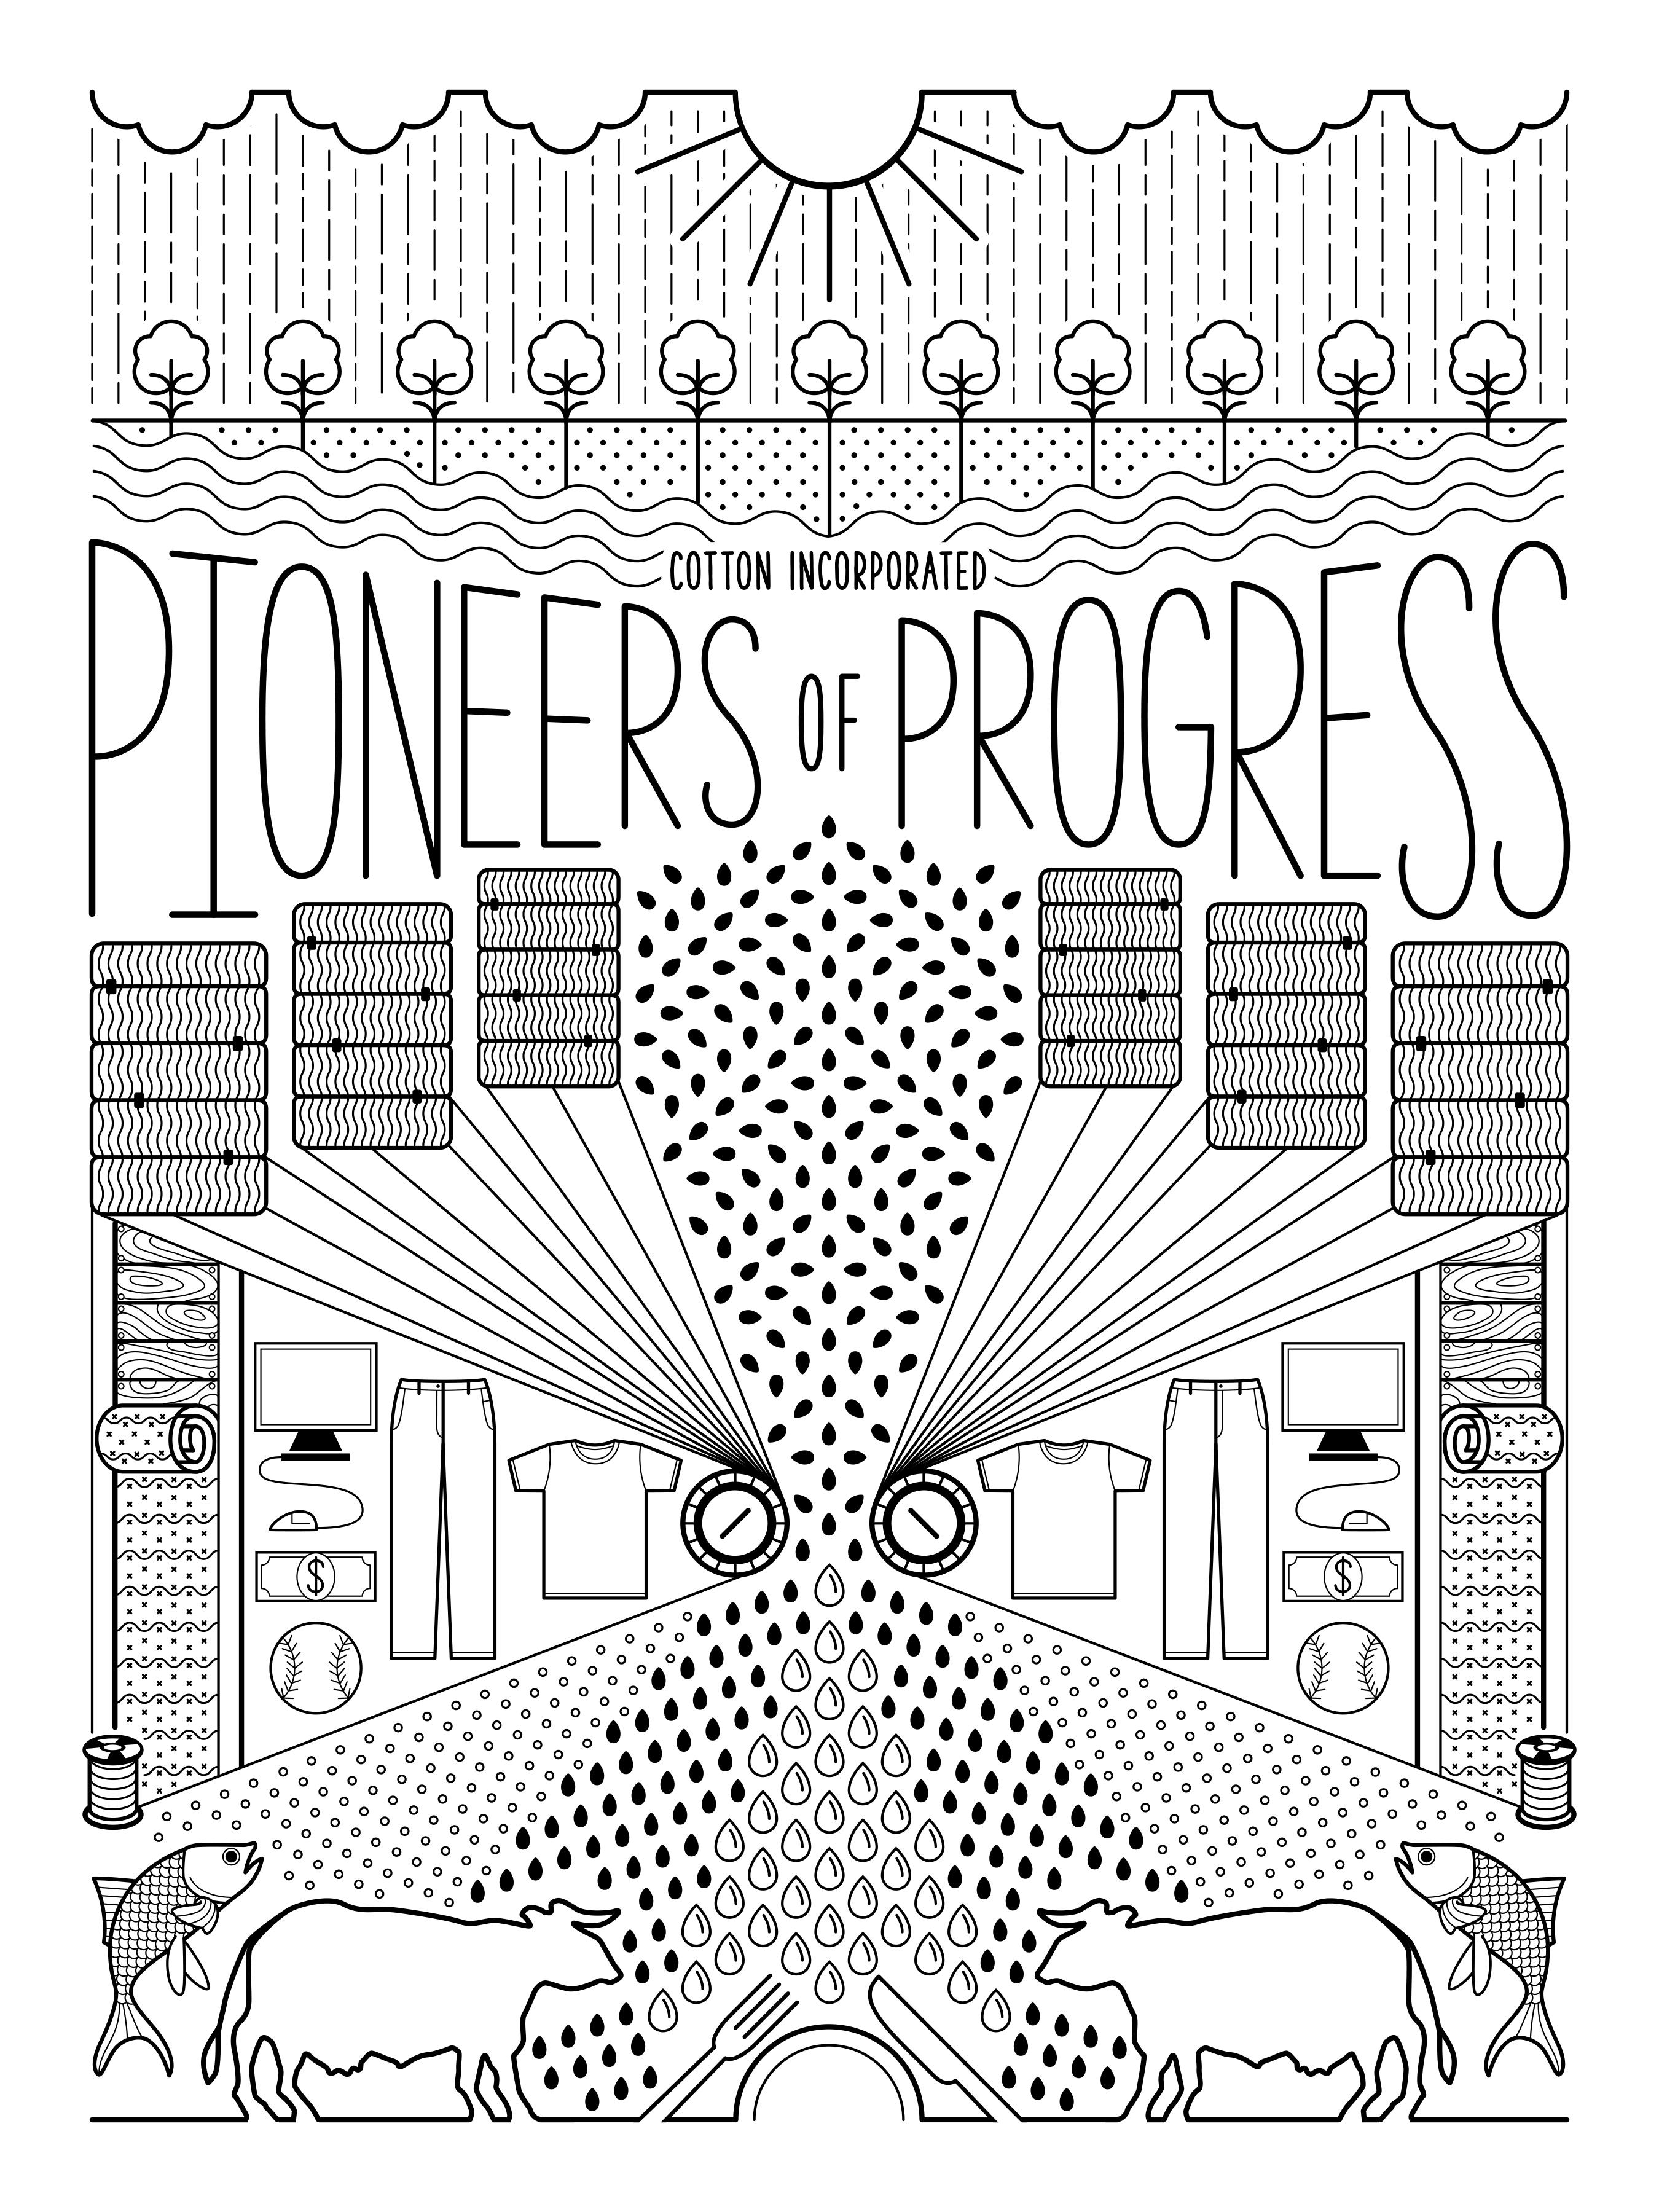 Pioneers of Progress